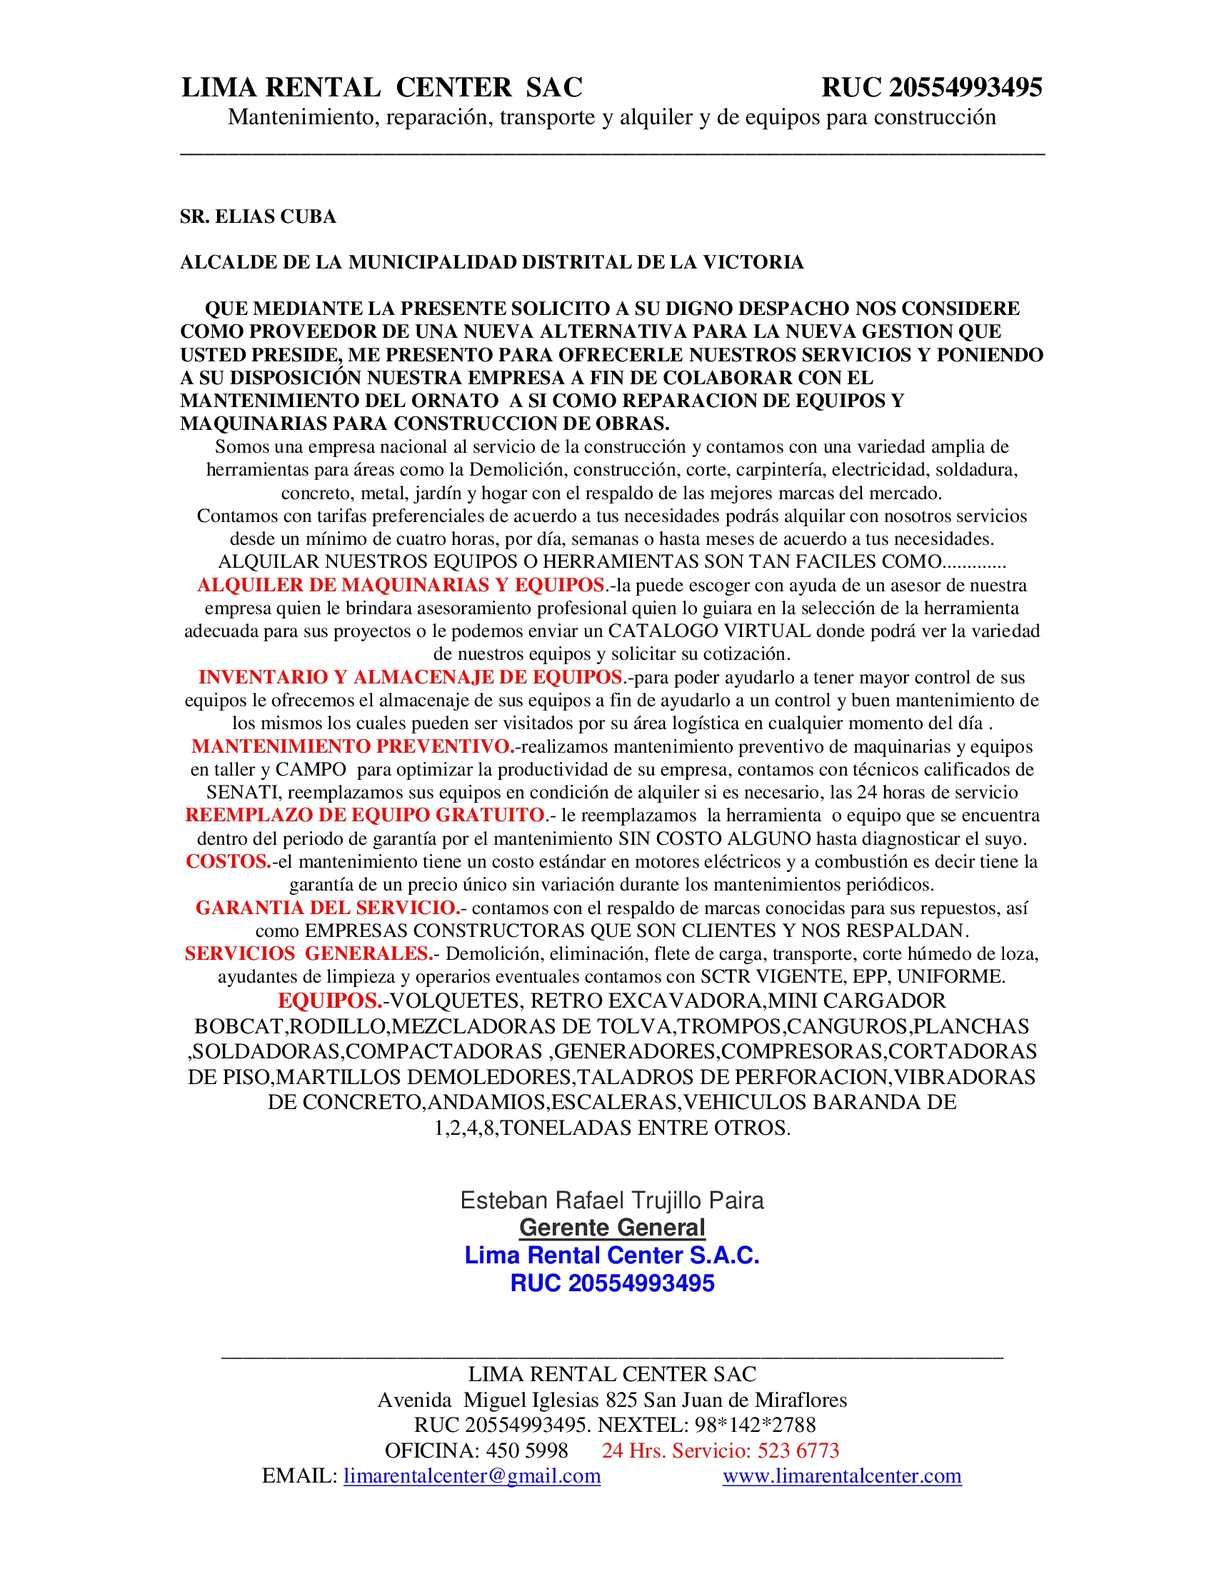 Calam o carta de presentacion pdf for Empresas construccion